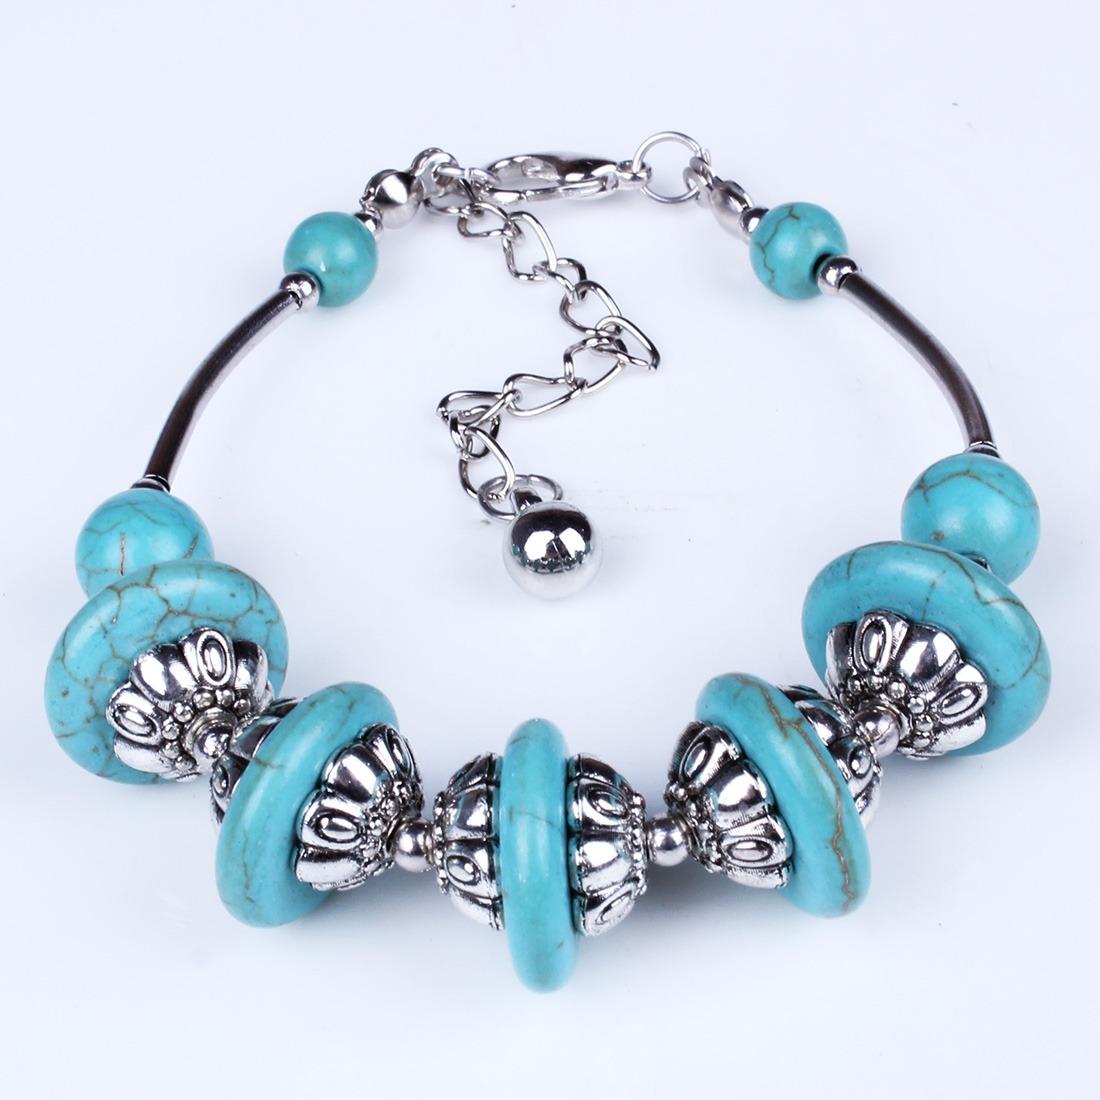 new Tibet silver turquoise blue stone bead bangle bracelet tribal браслет